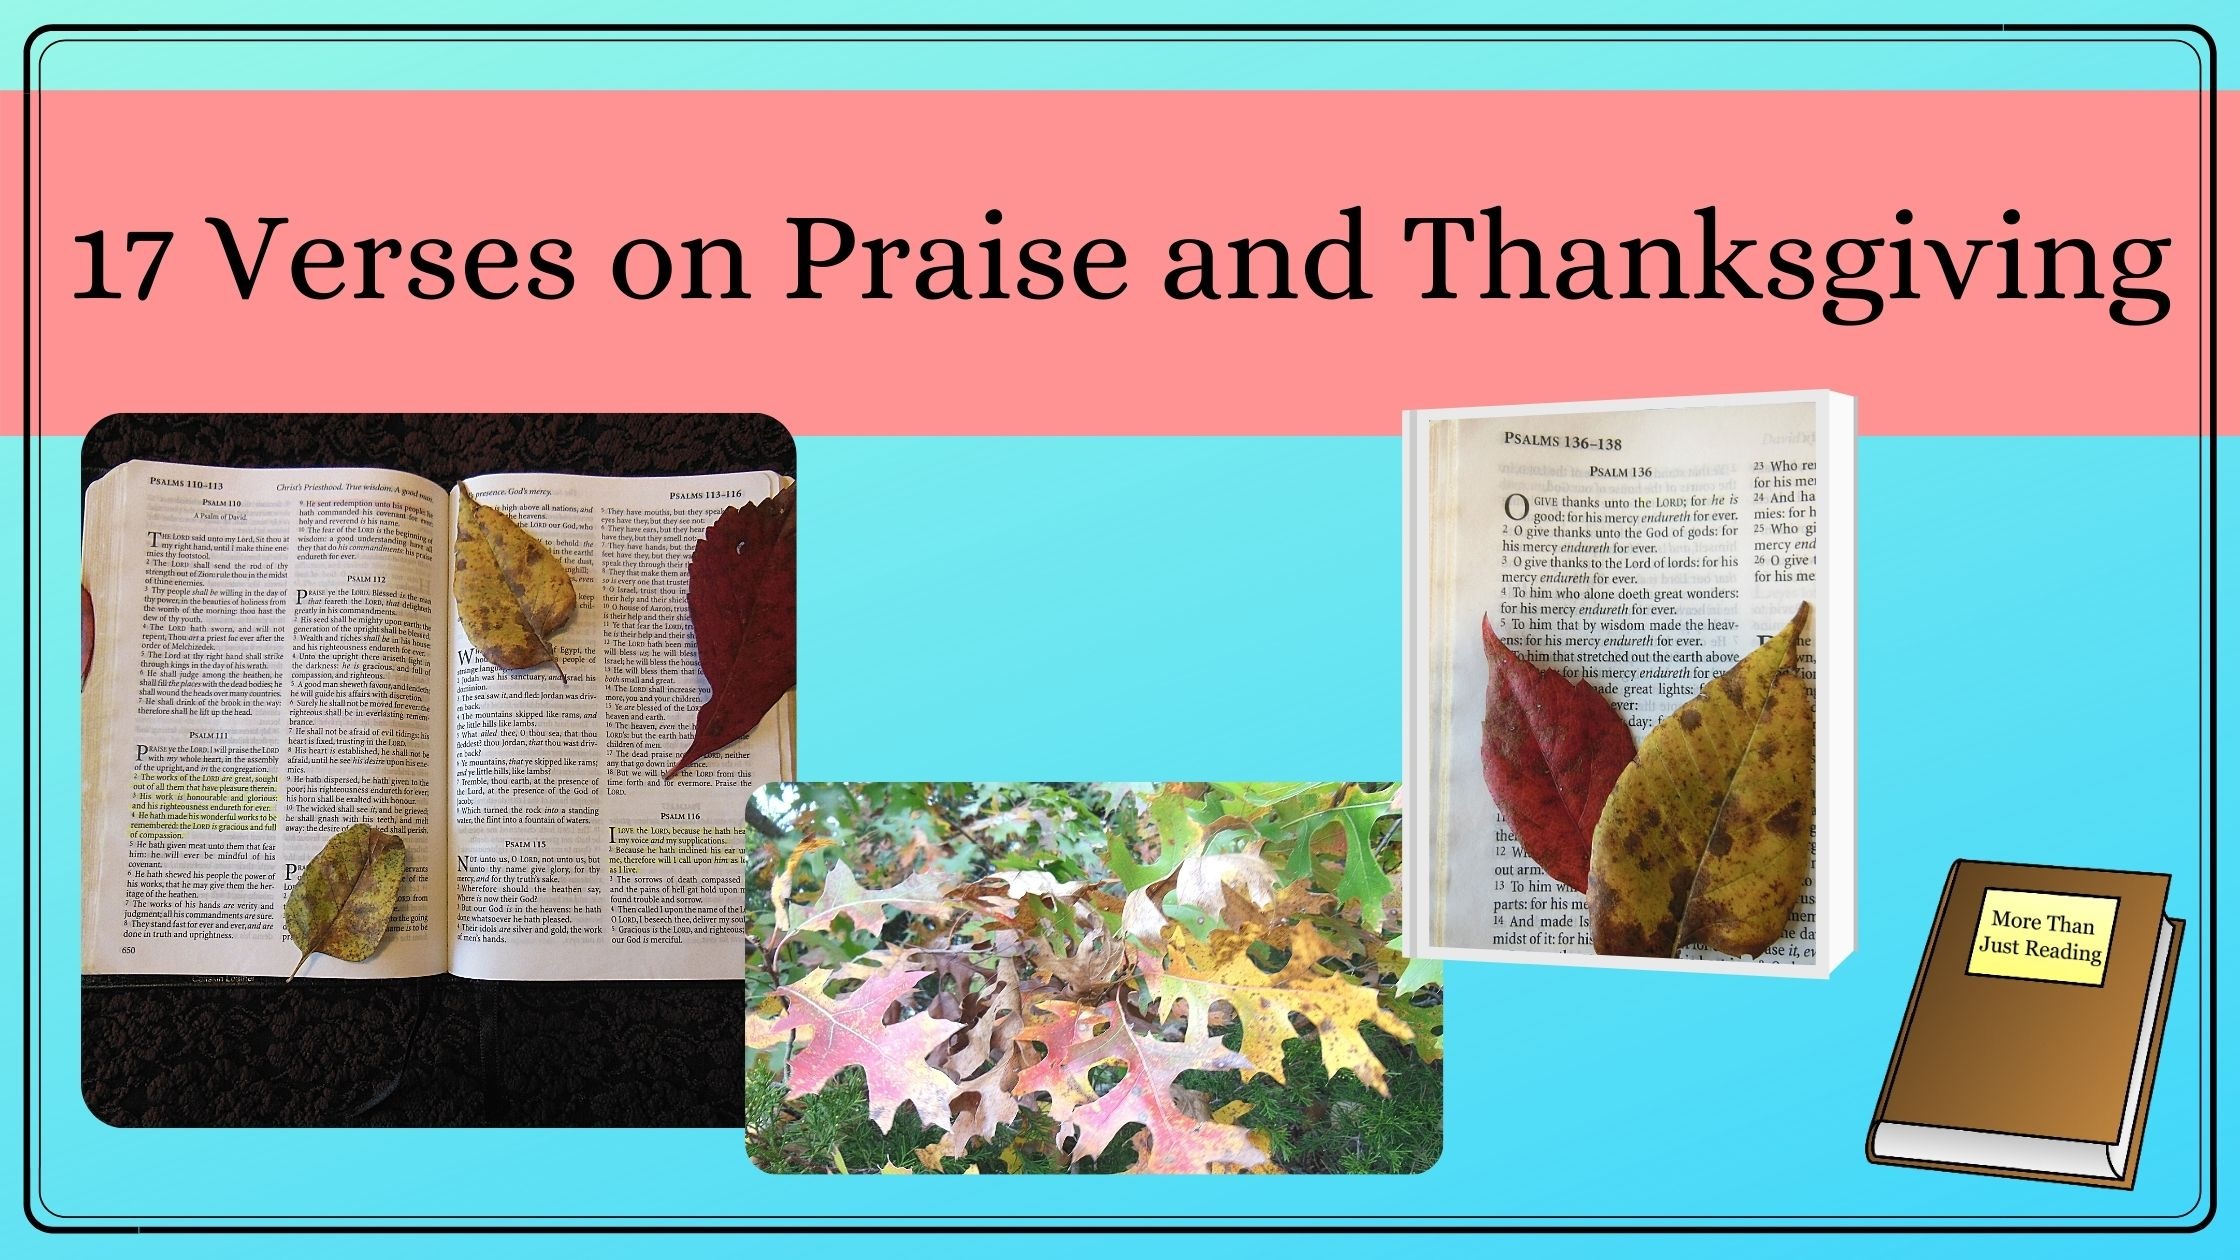 Bible verses on thanksgiving